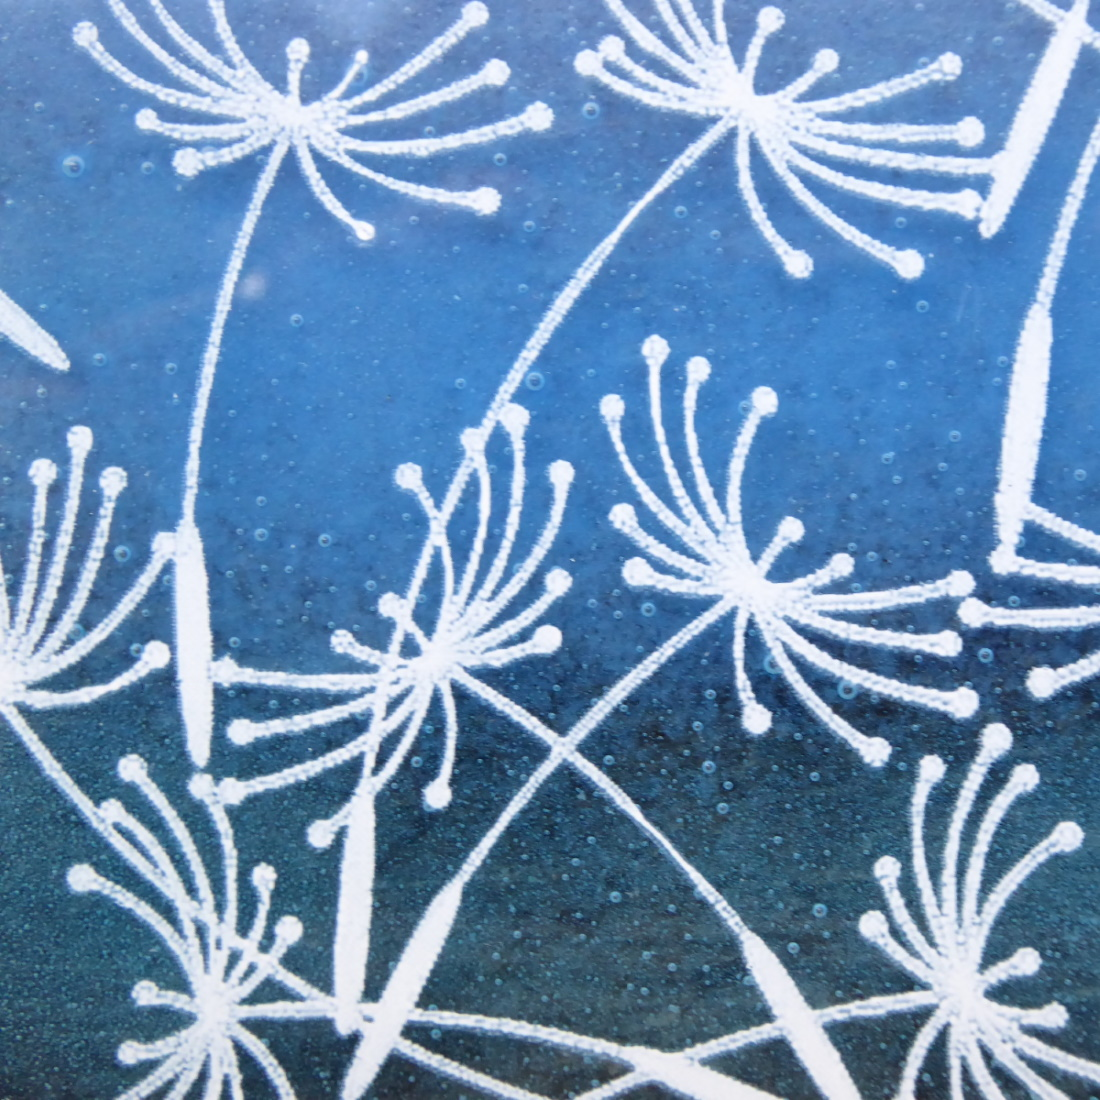 Dandelion clocks close-up